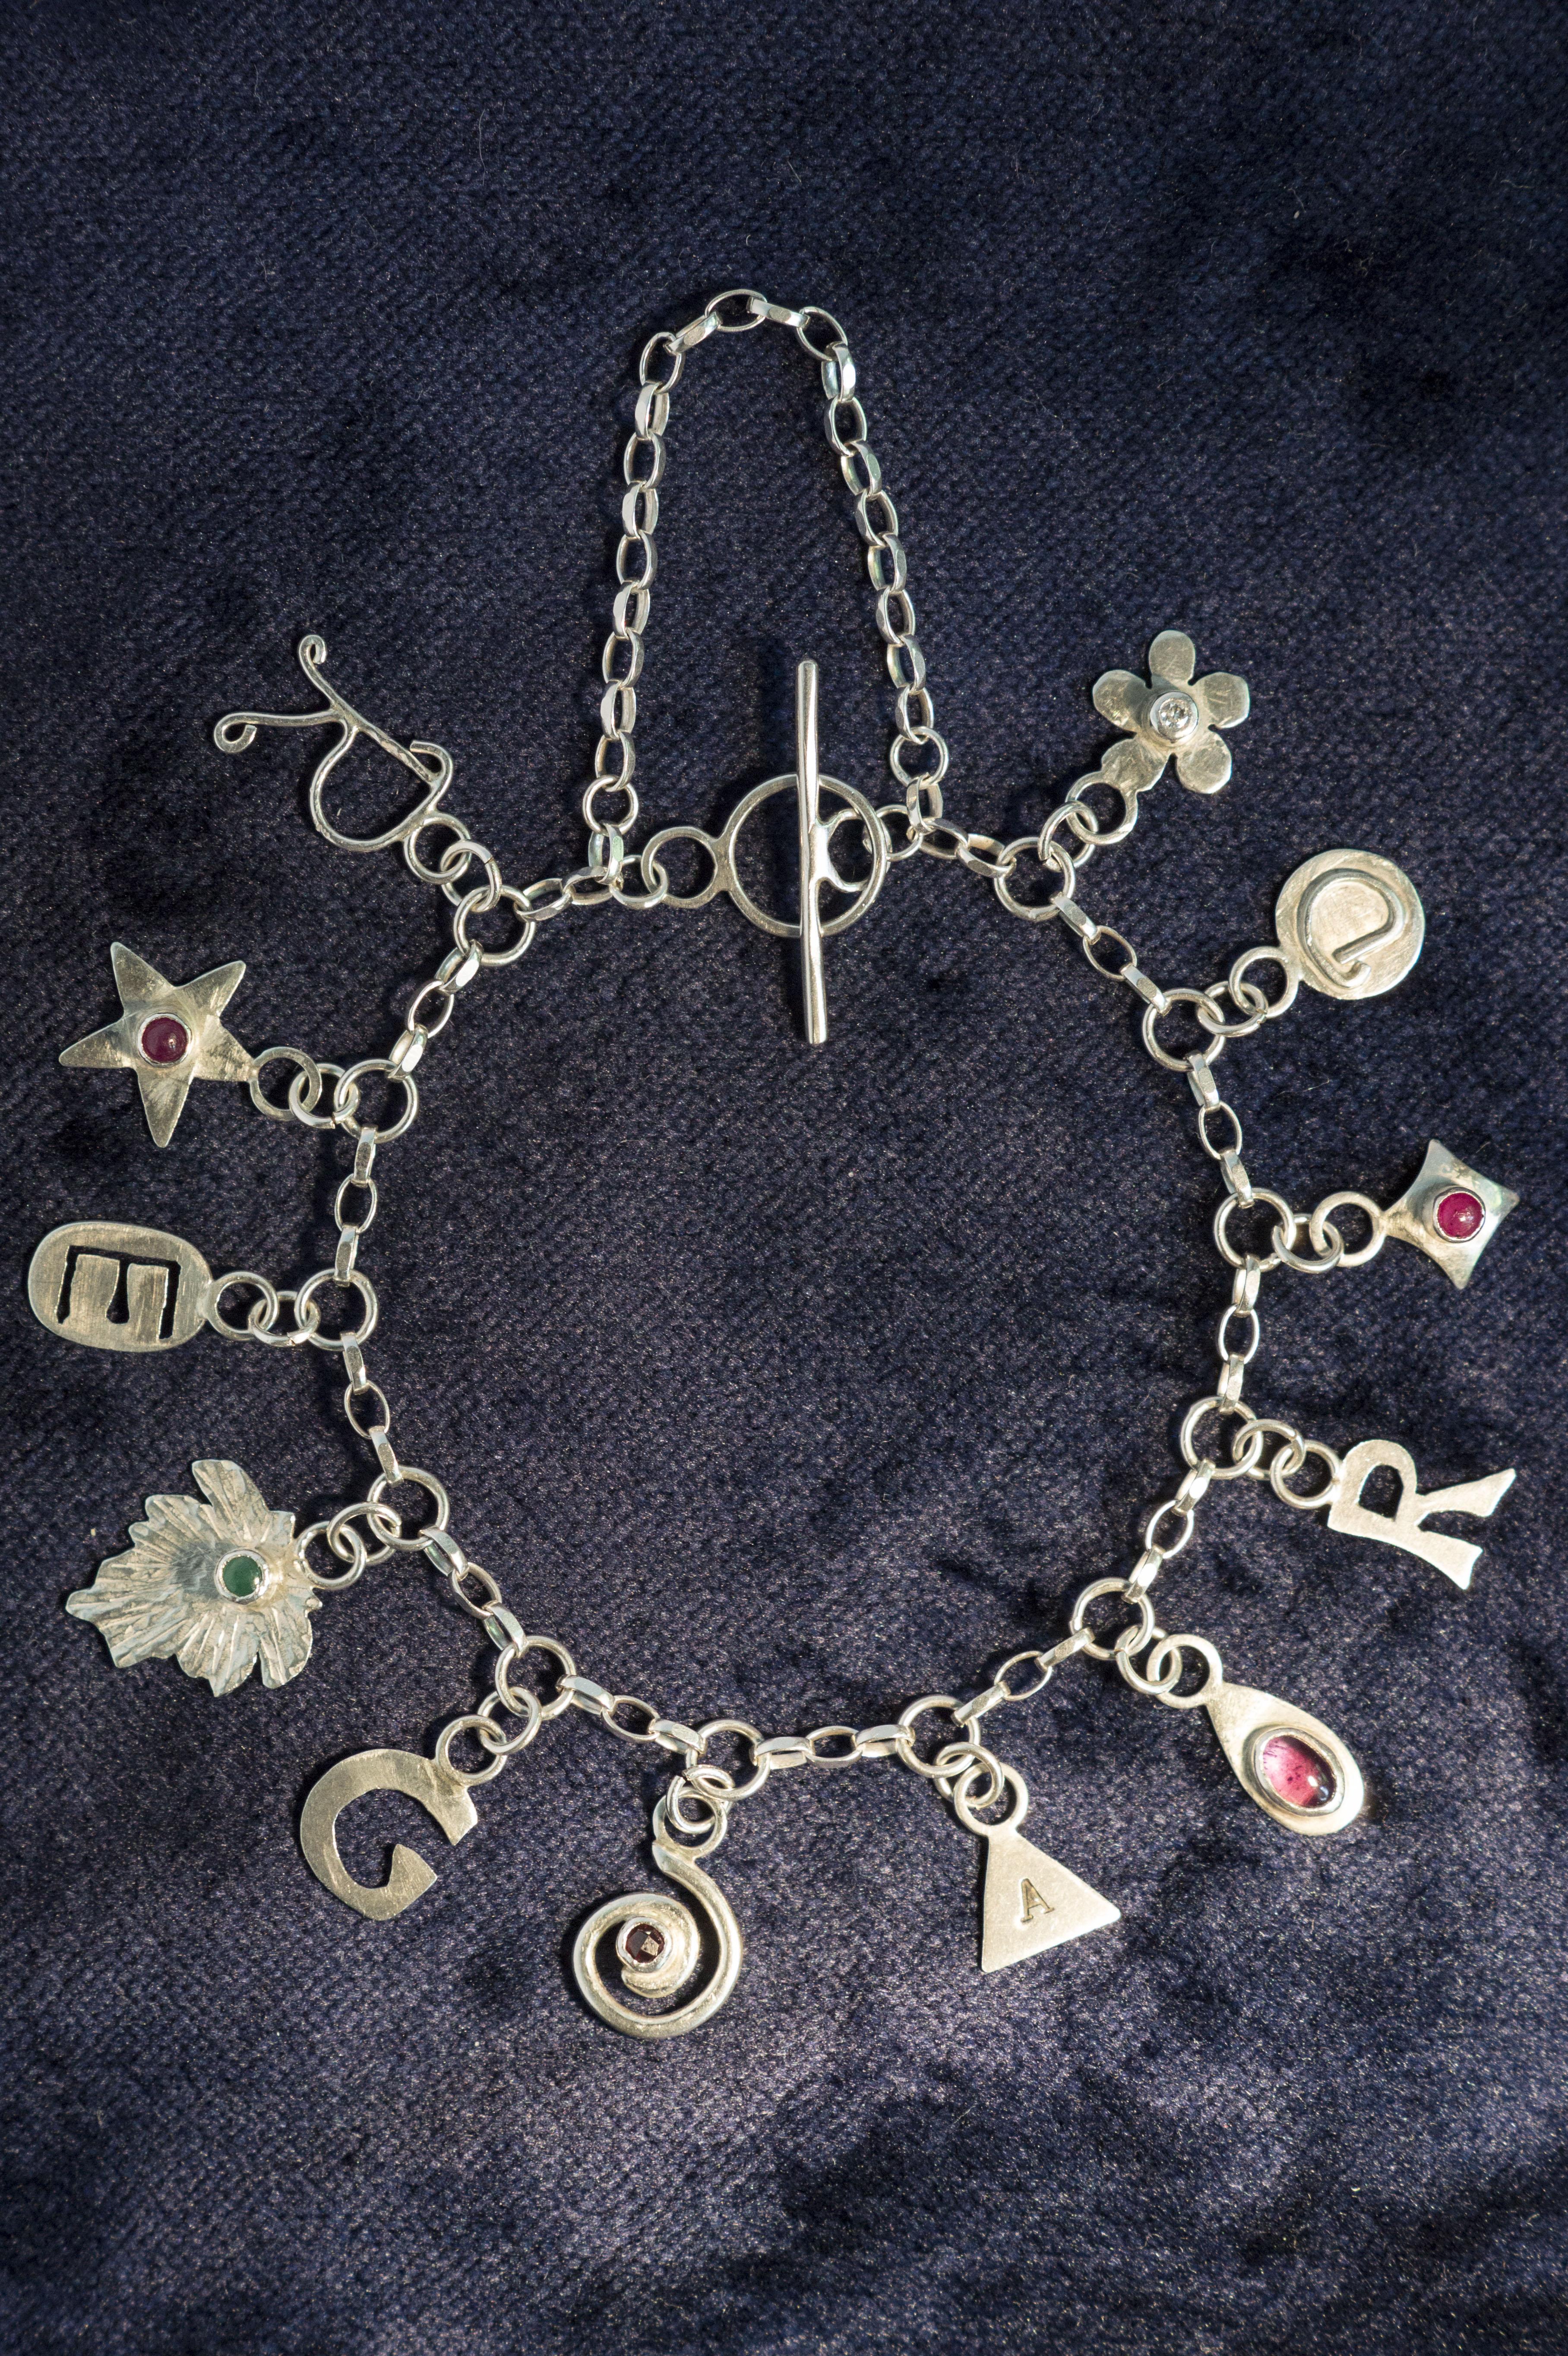 R.E.G.A.R.D Charm Bracelet